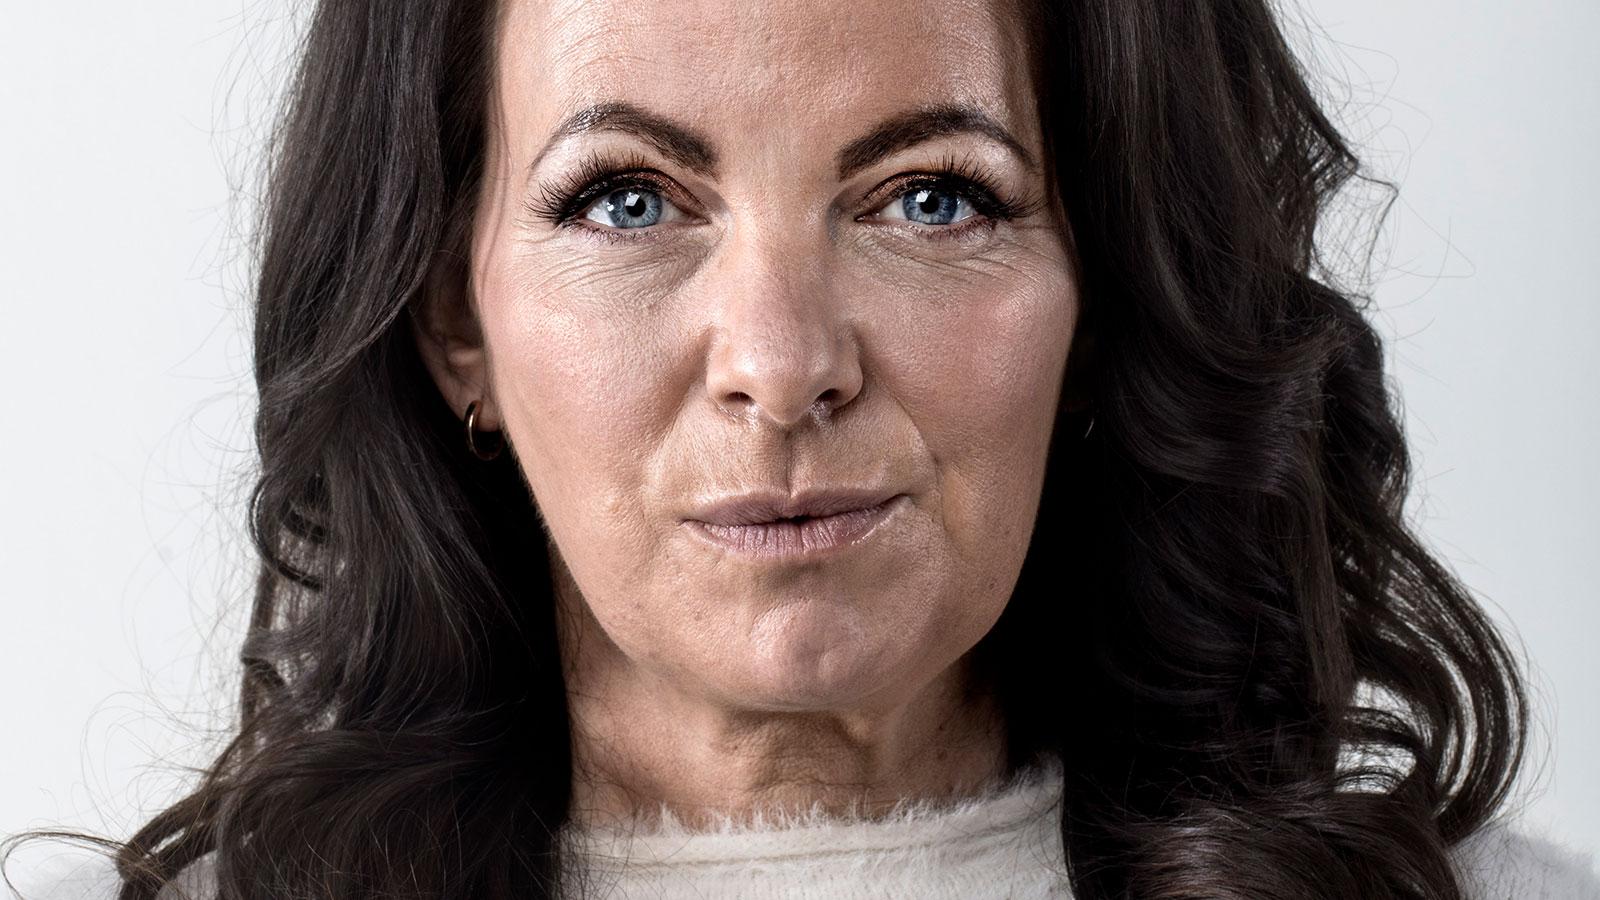 Sex Samlevnadsrdgivning Katarina Katarina Stockholm - Hitta